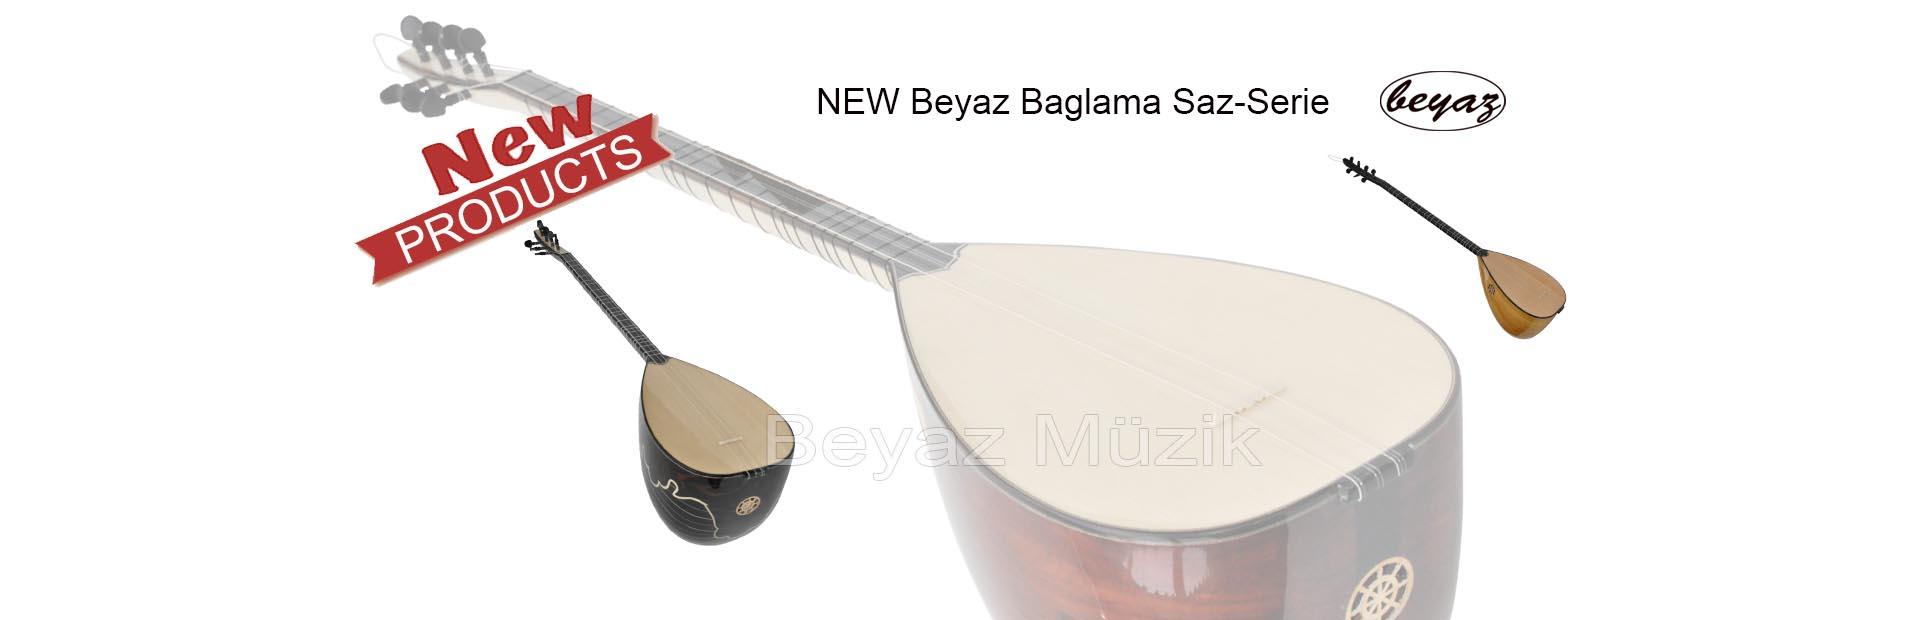 New Seire Baglama